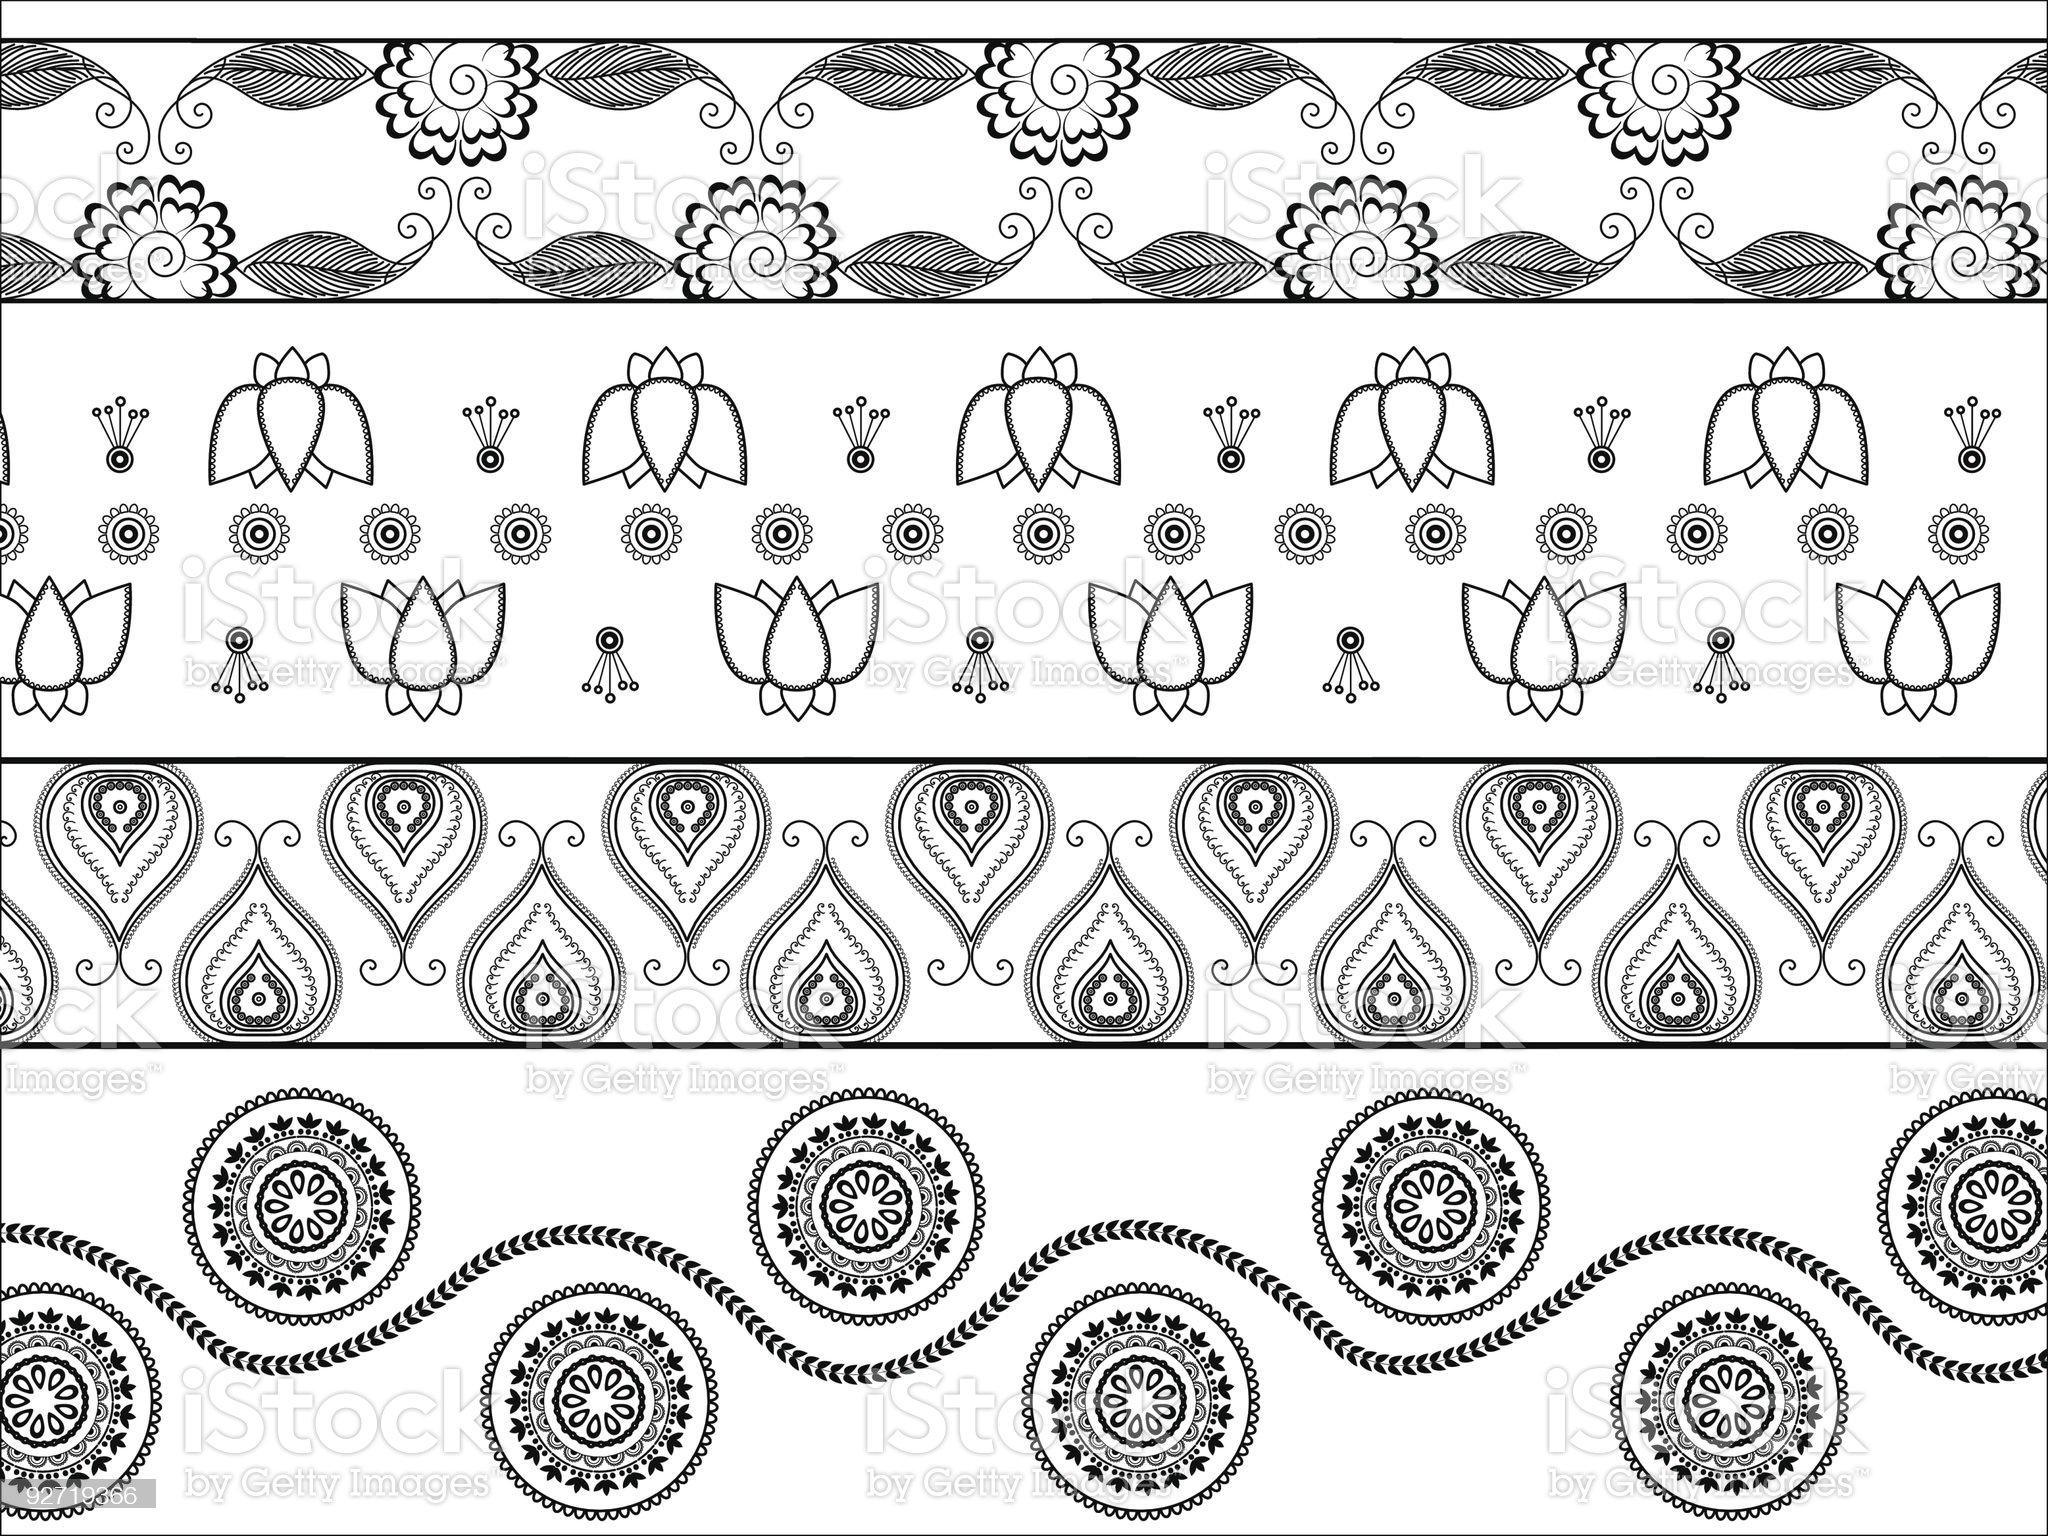 Henna border designs royalty-free stock vector art